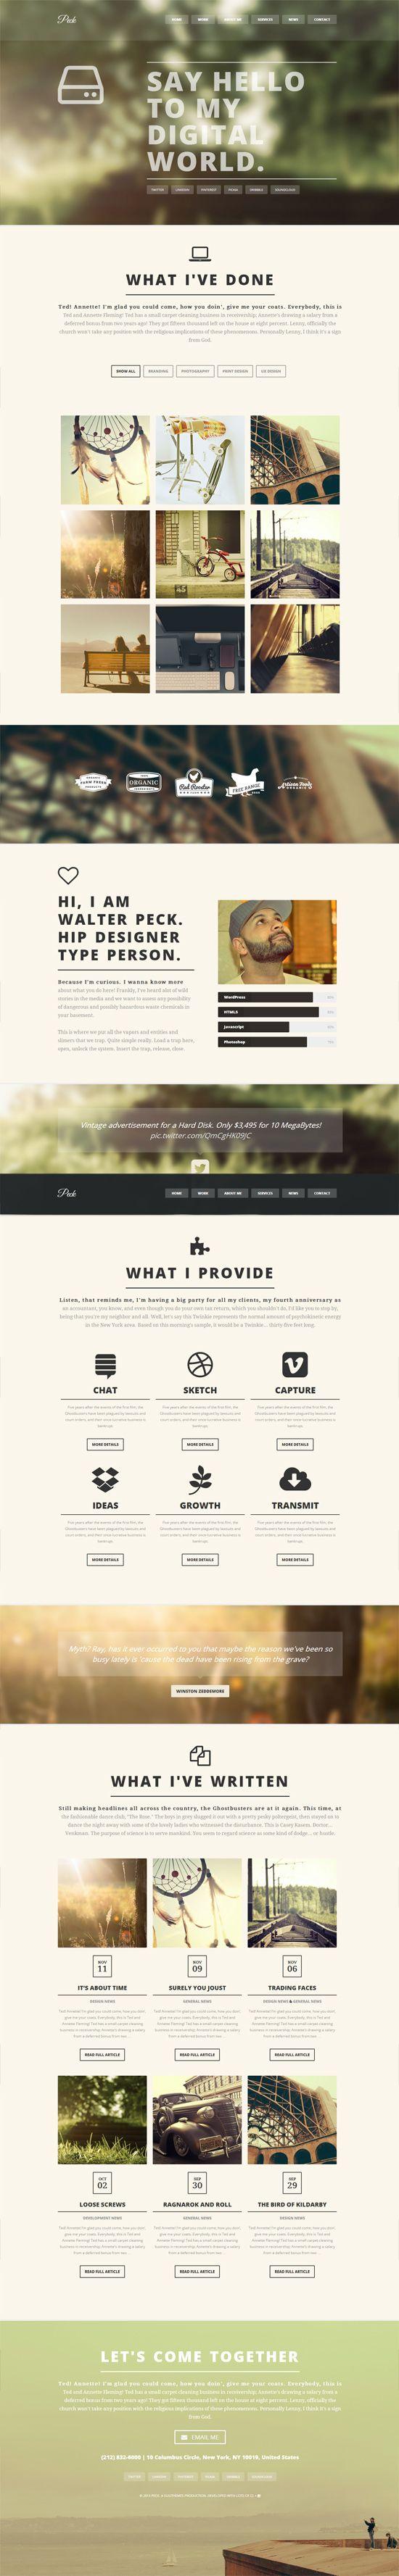 PECK - Creative One Page WordPress Theme  Tendances Iscomigoo Webdesign http://iscomigoo-webdesign.blogspot.fr  #iscomigoo #webdesign #tendances